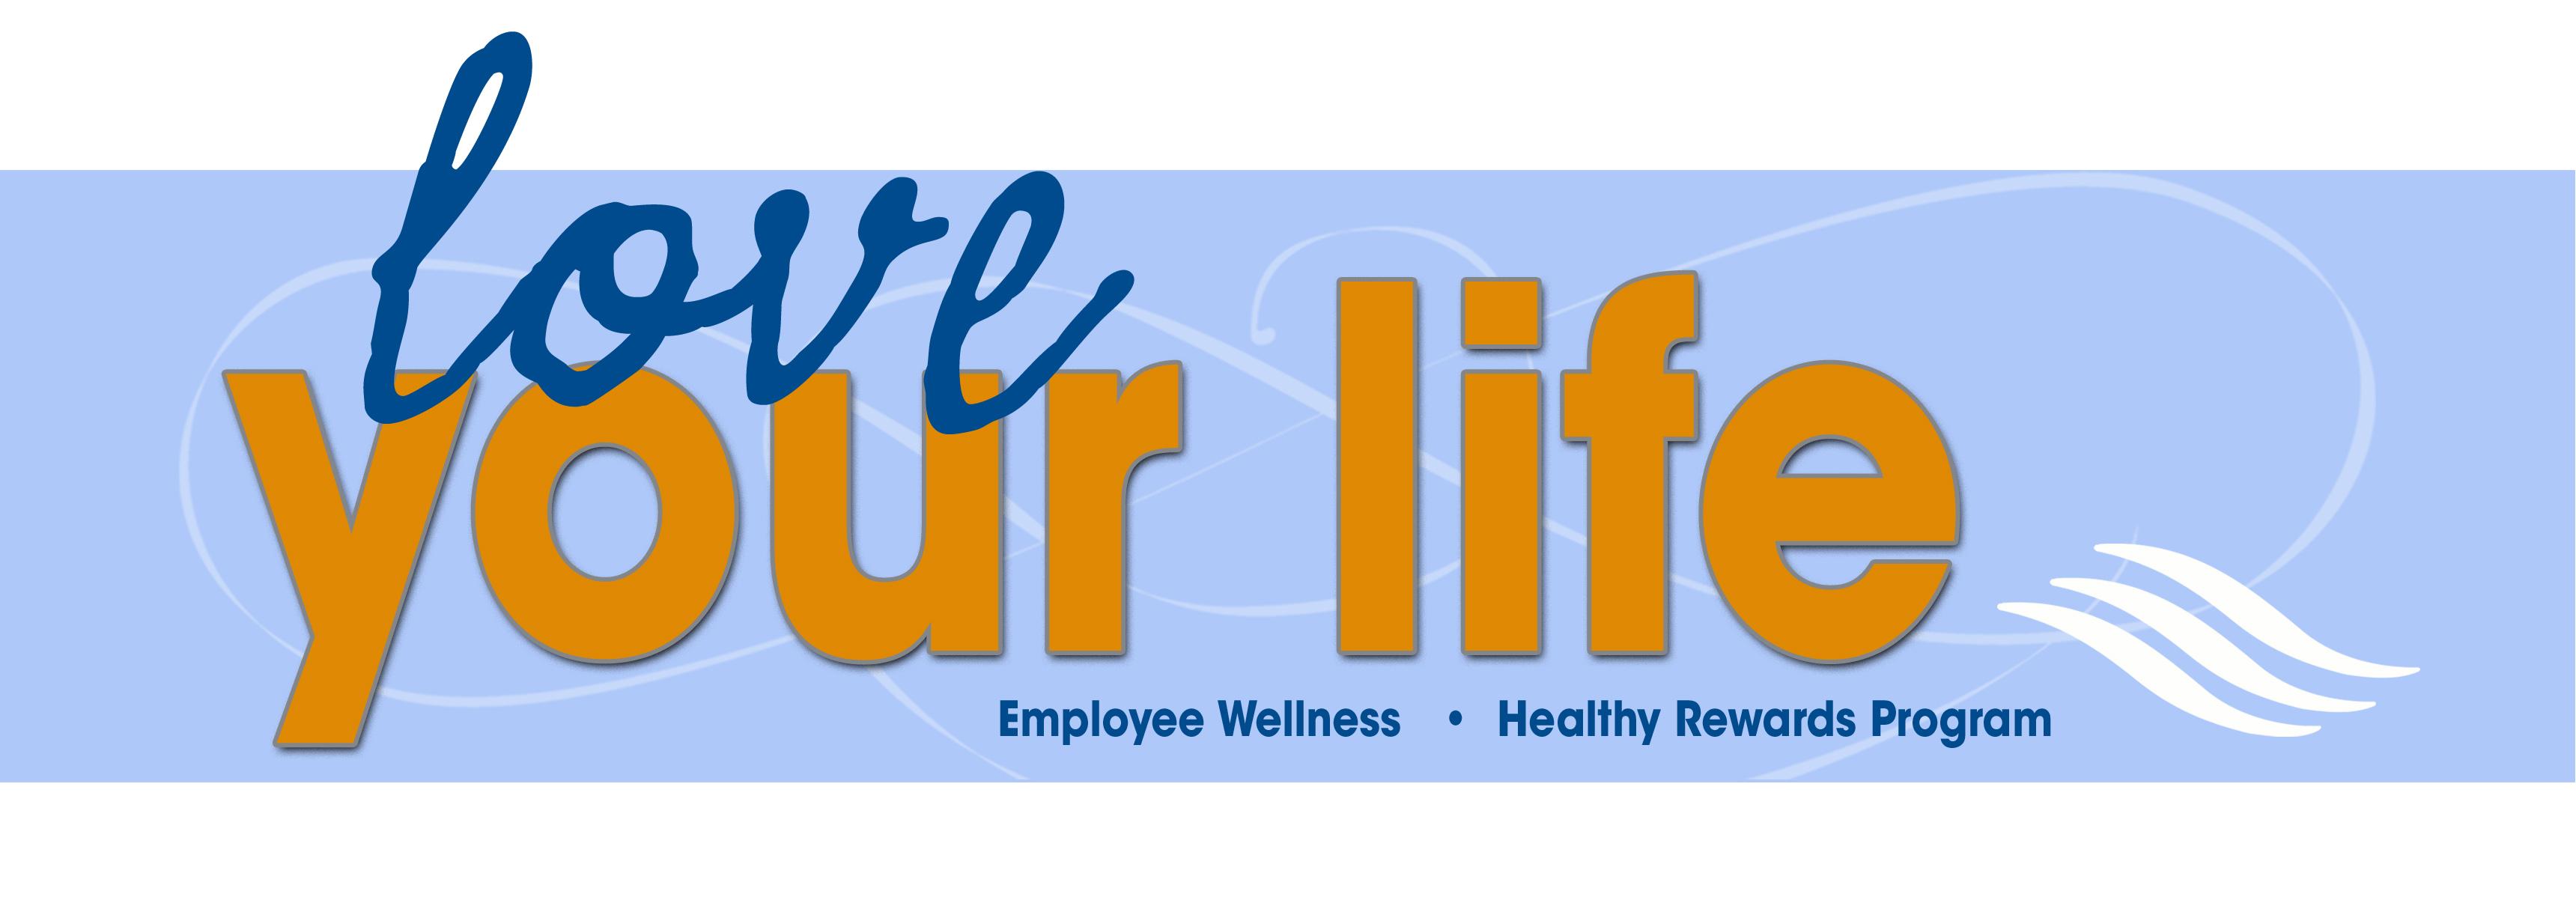 Love Your Life & Employee Wellness